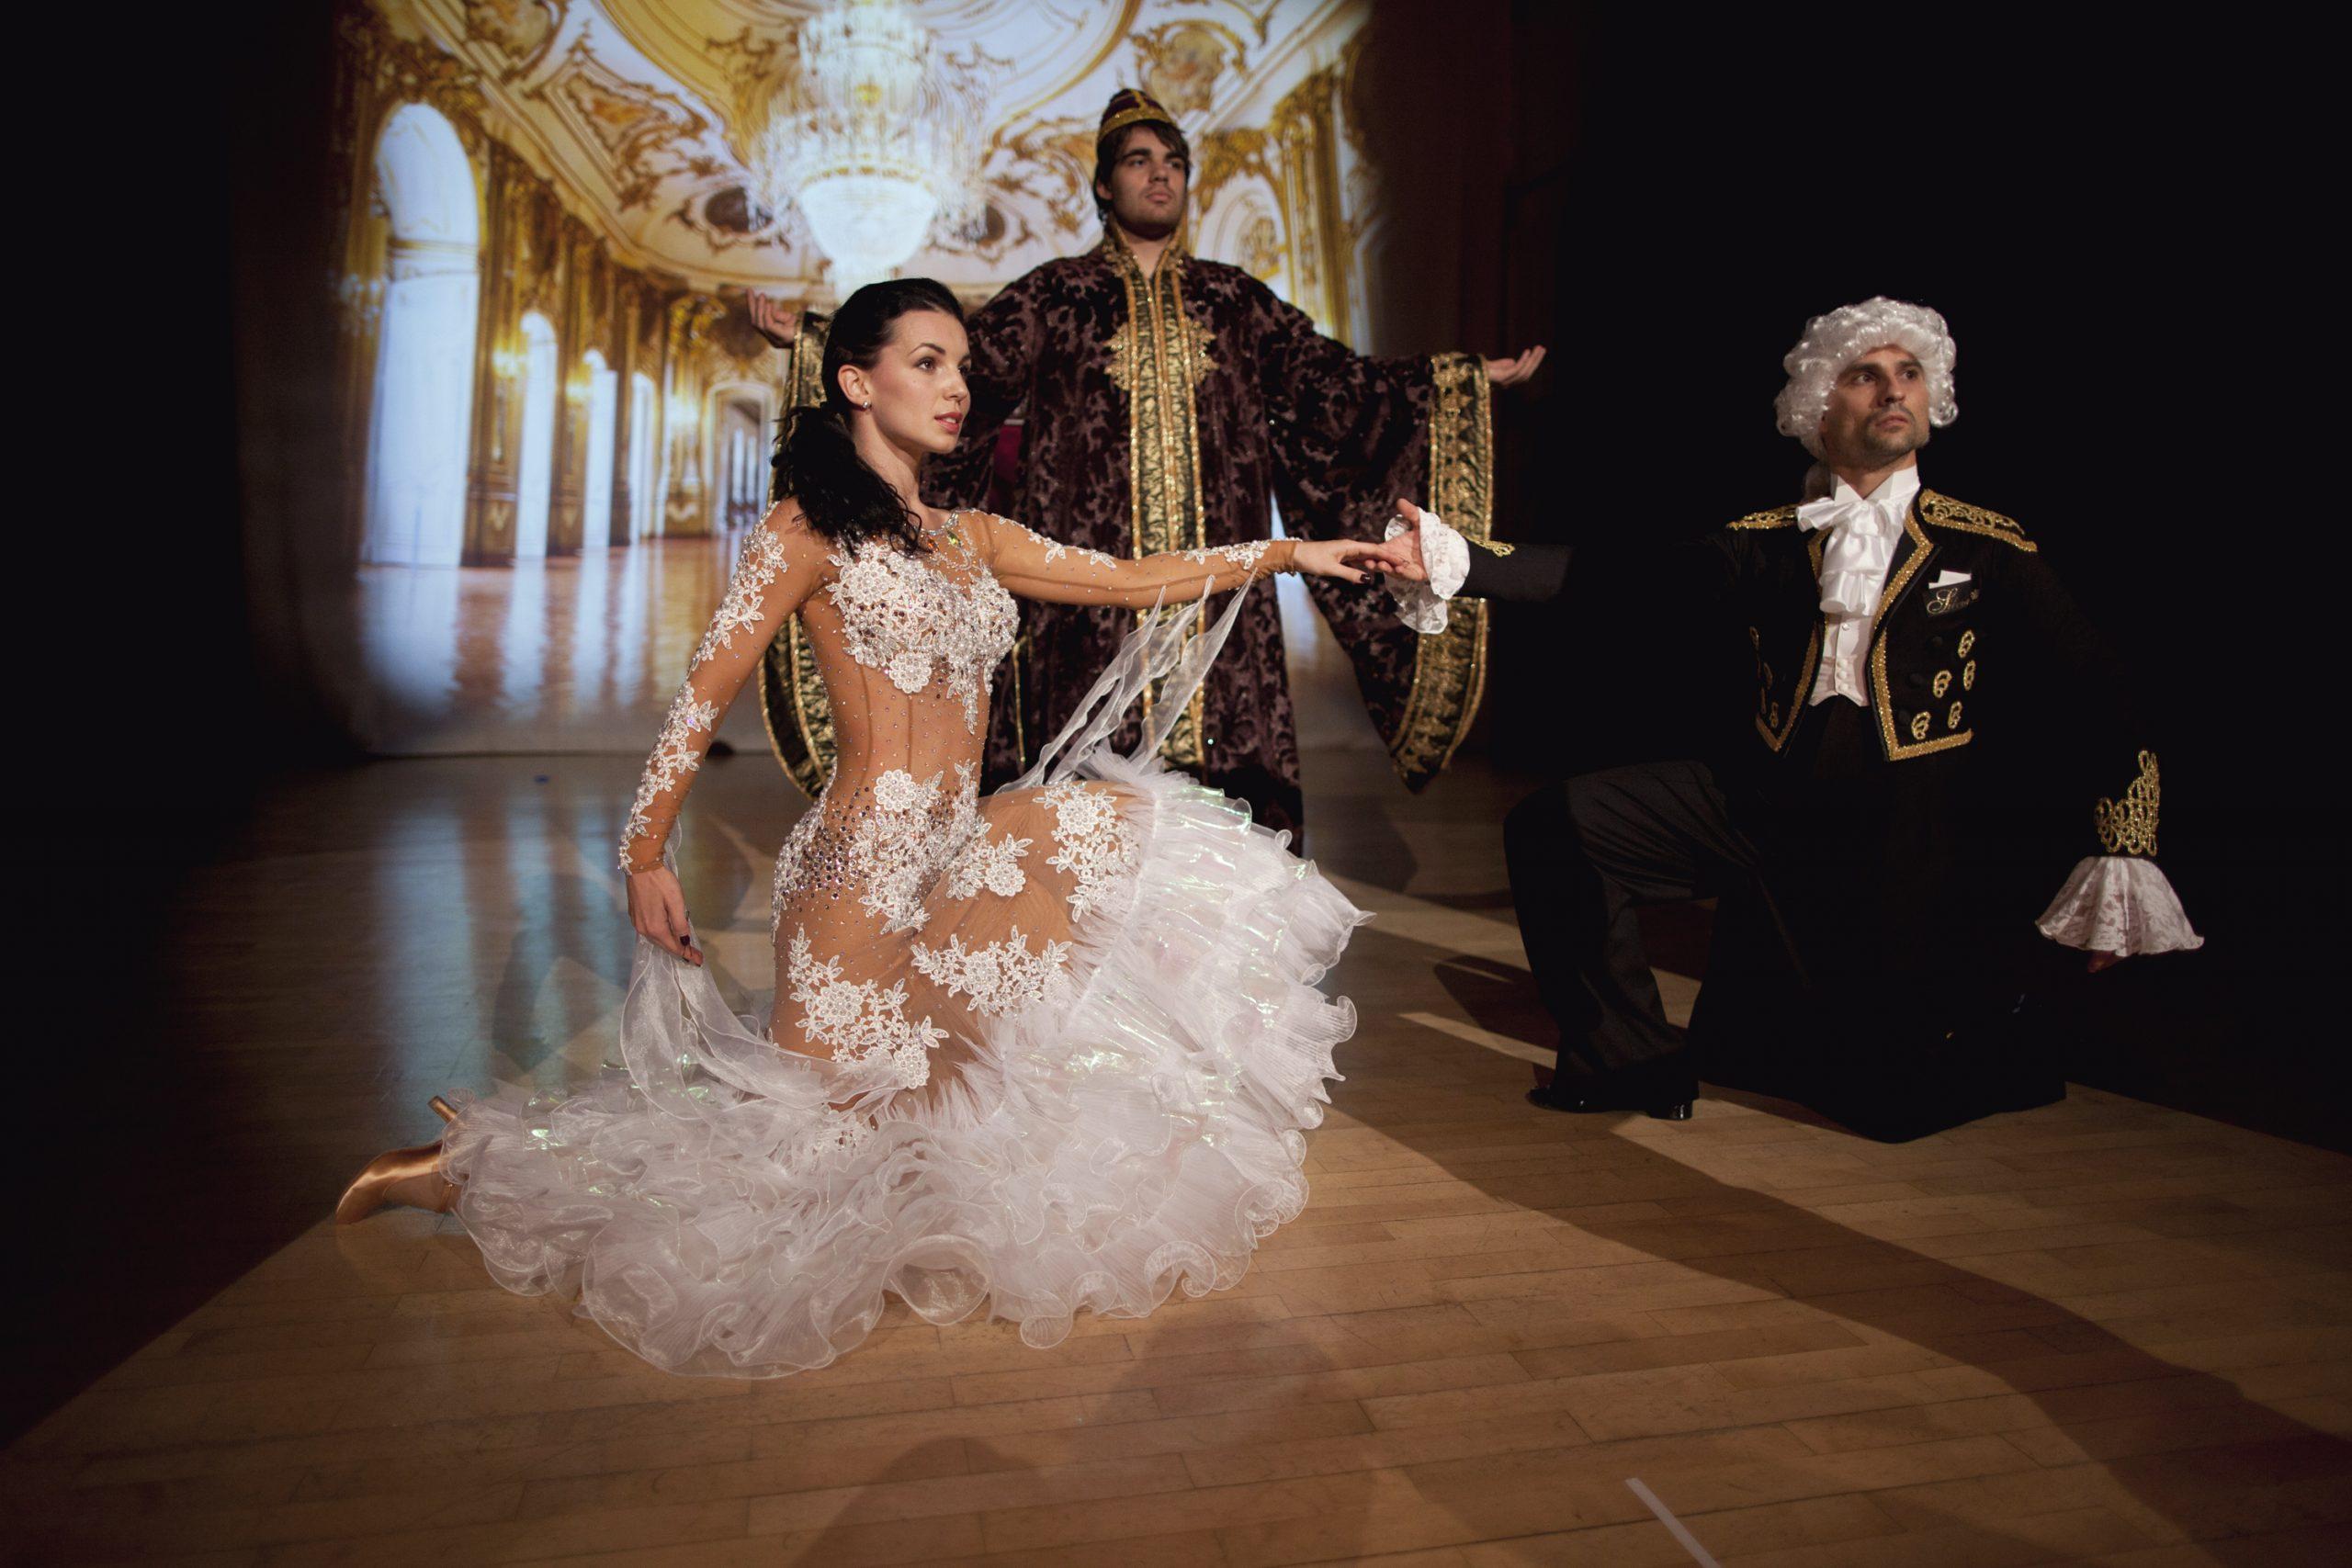 lt-dance-venetian nostalgy-luca bussoletti tjasa vulic